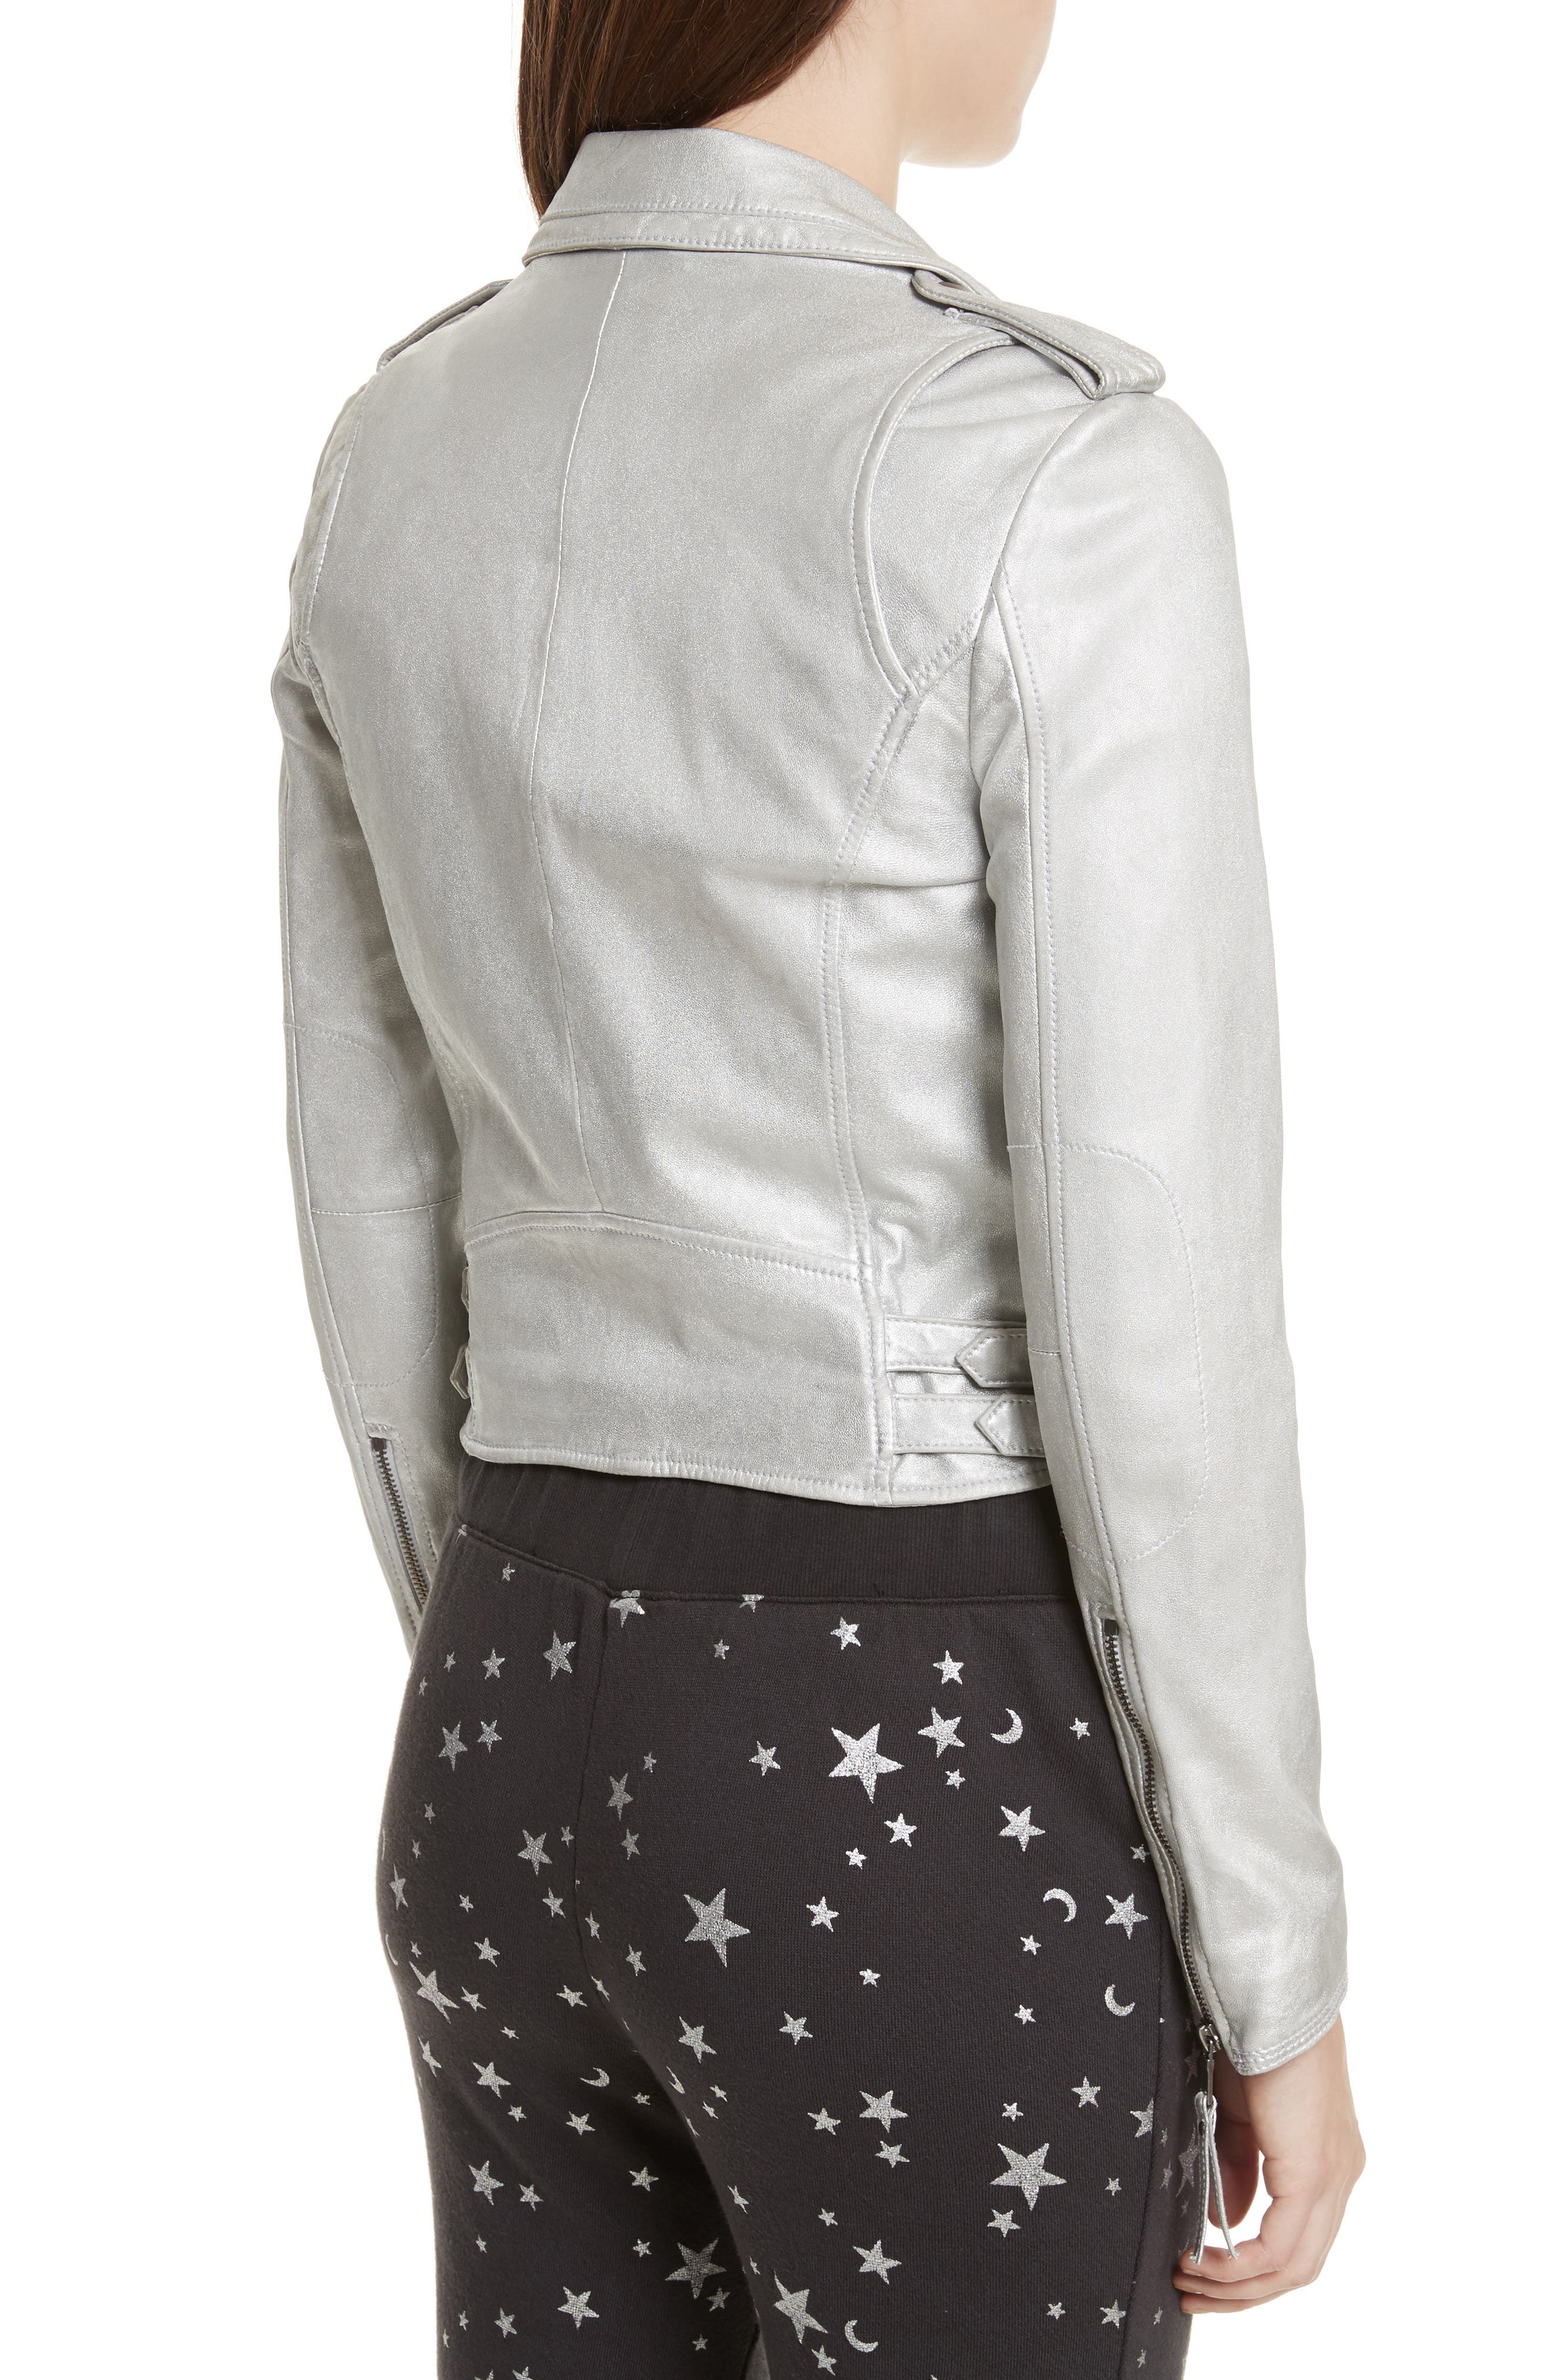 Leolani Leather Jacket,                             Alternate thumbnail 2, color,                             Silver